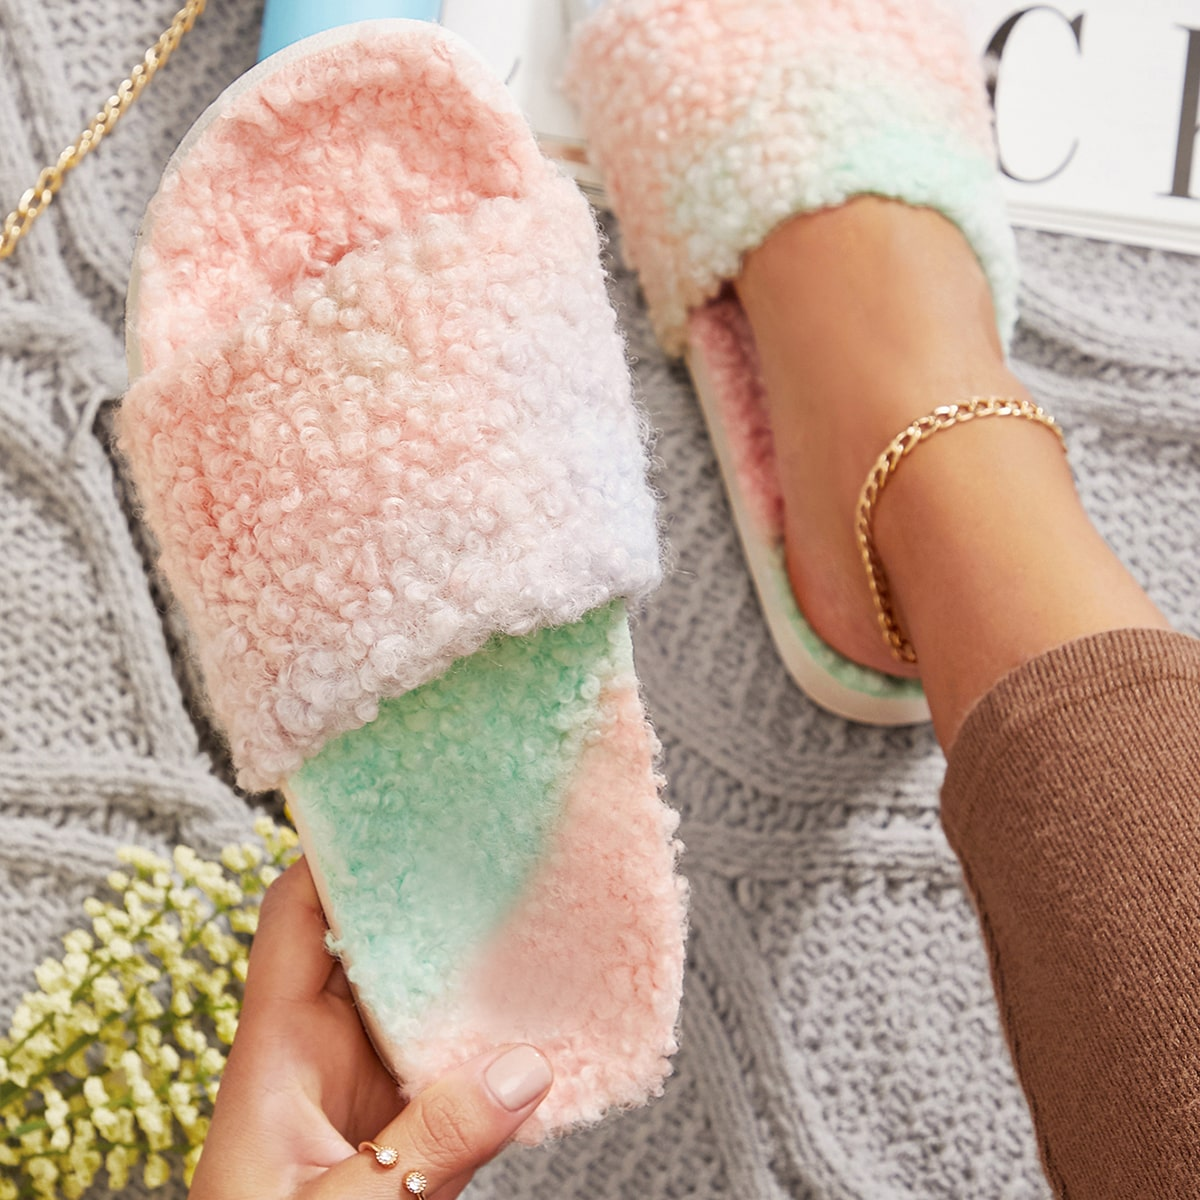 SHEIN / Multicolored Fuzzy Faux Fur Slippers